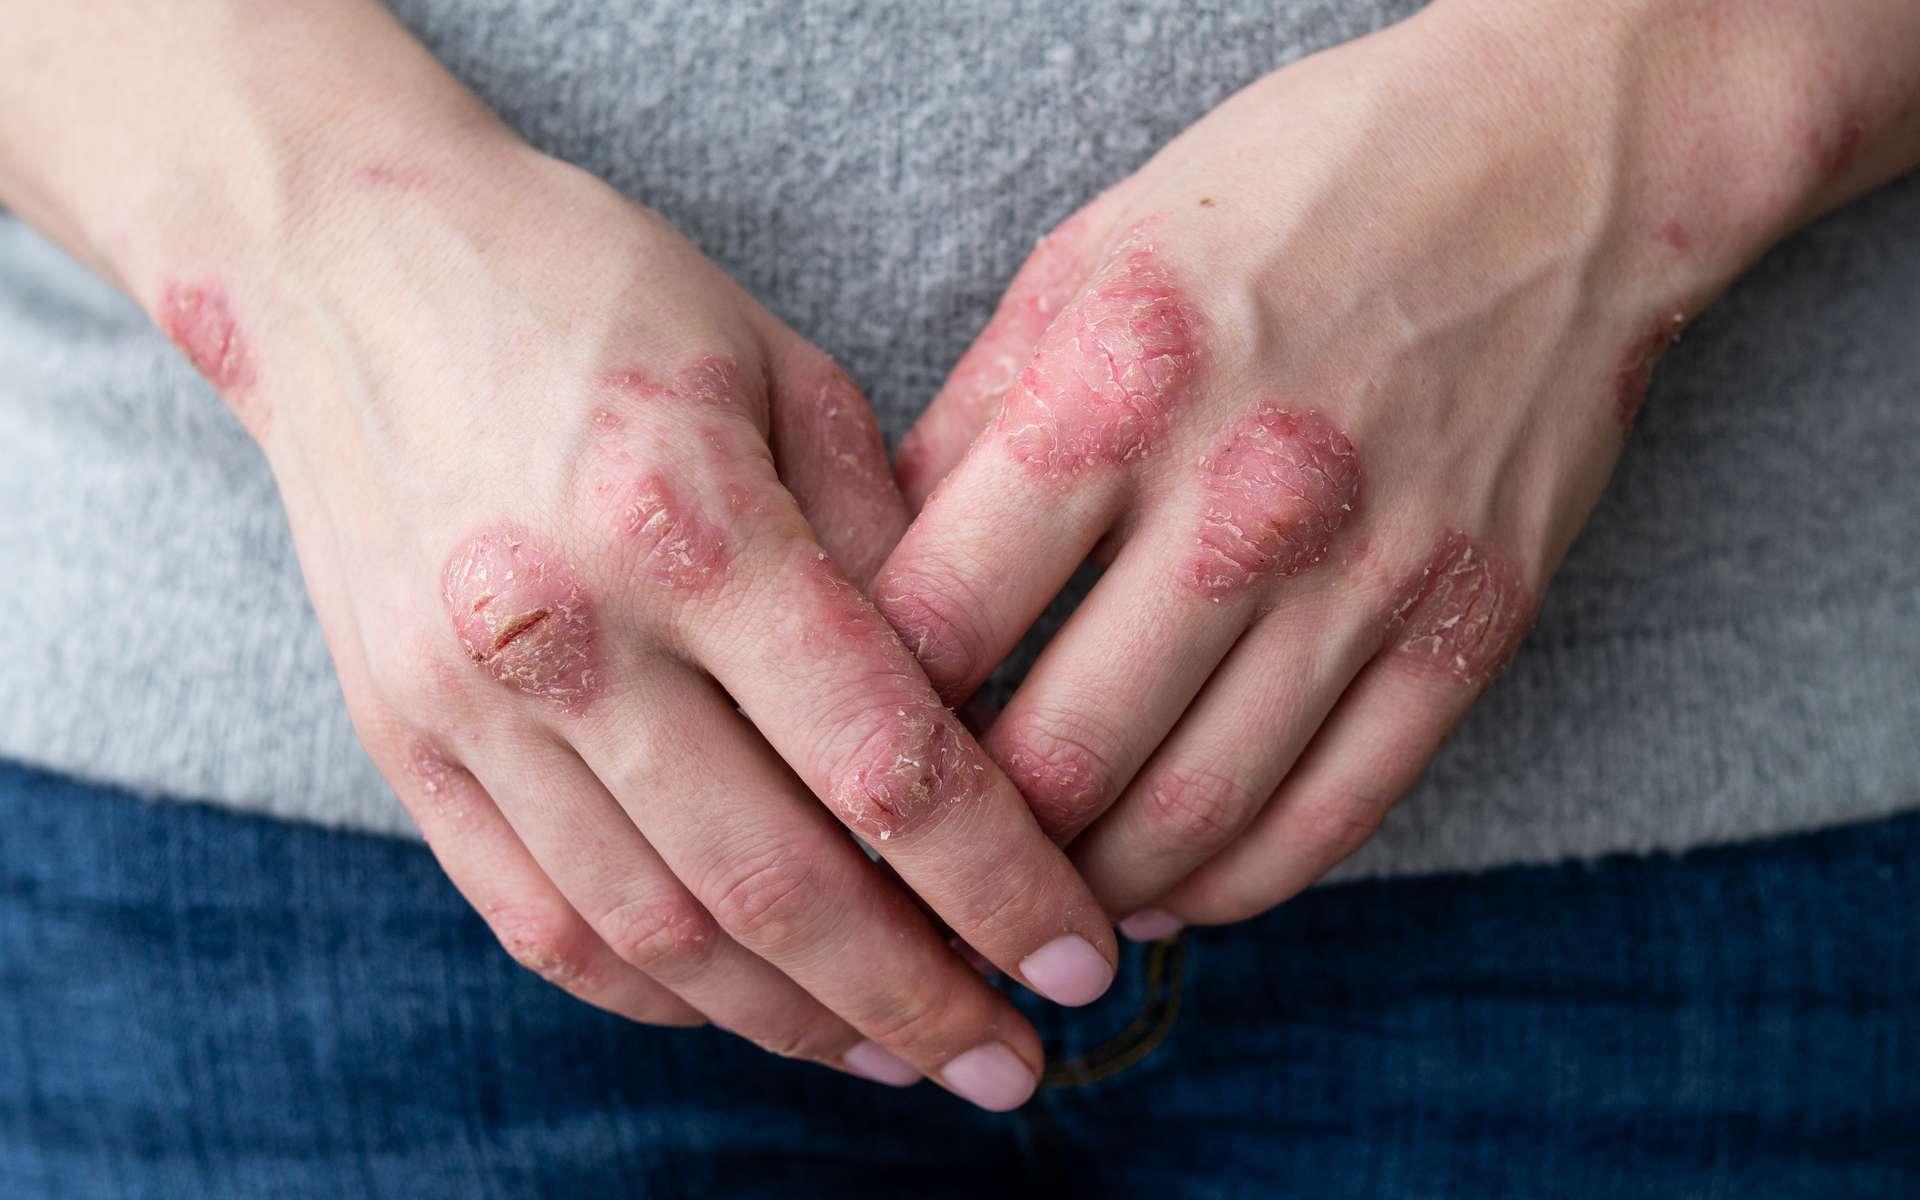 Non, le psoriasis n'est pas contagieux © IIIRusya, Adobe Stock